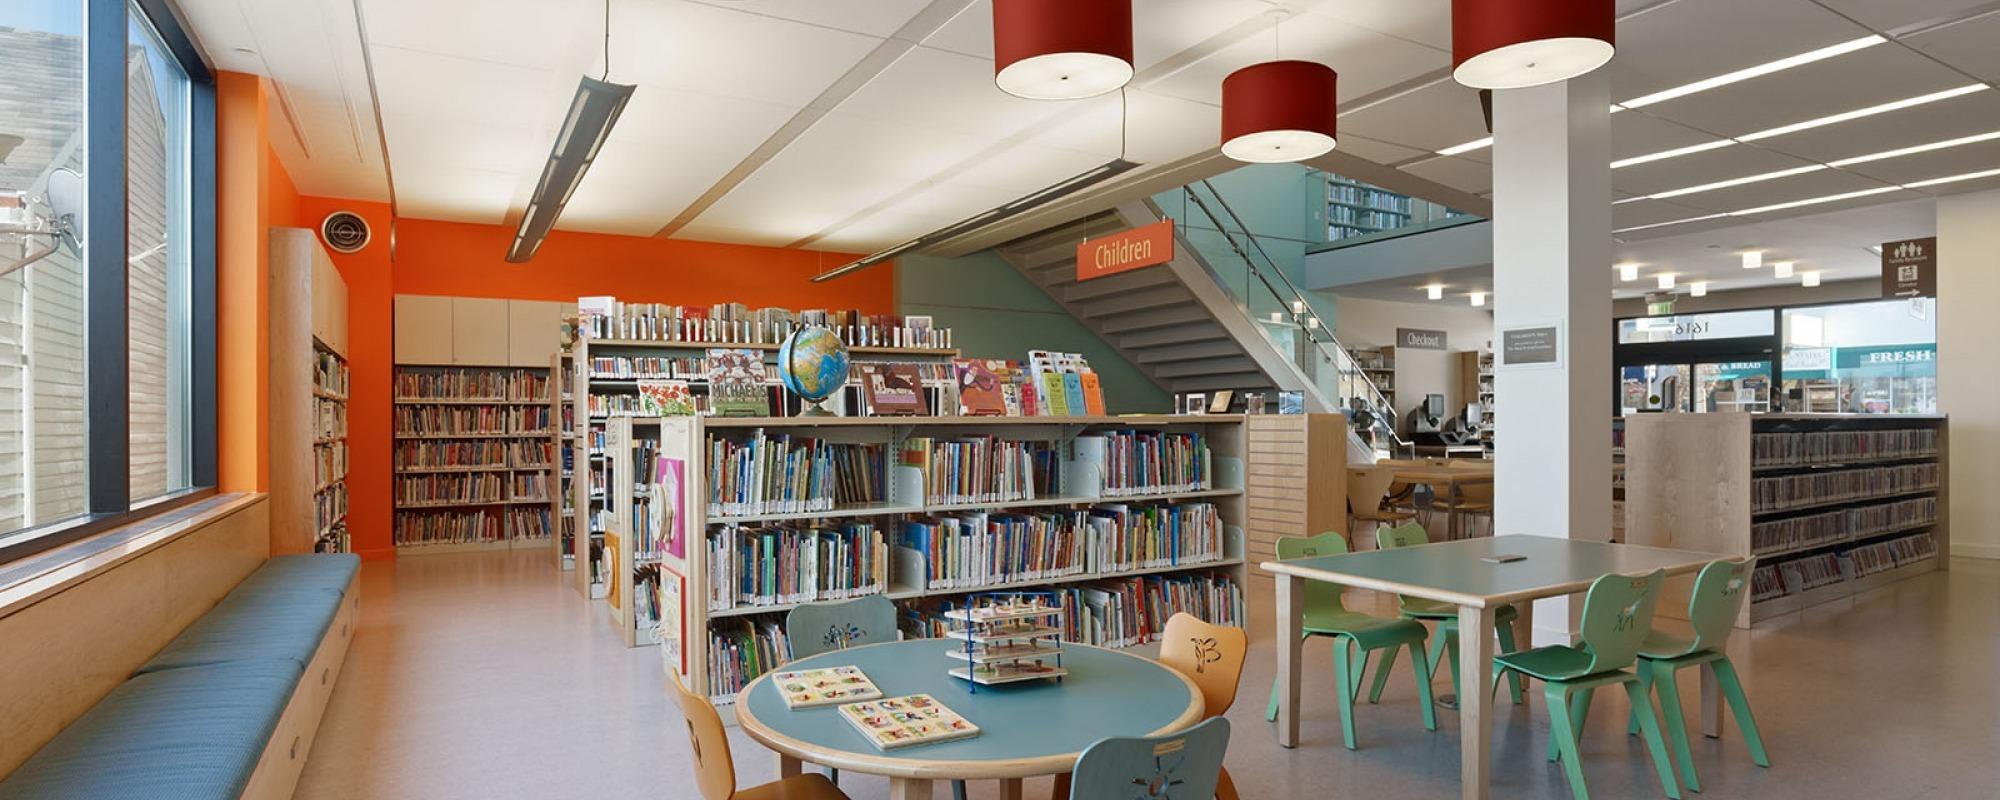 Potrero Branch Library